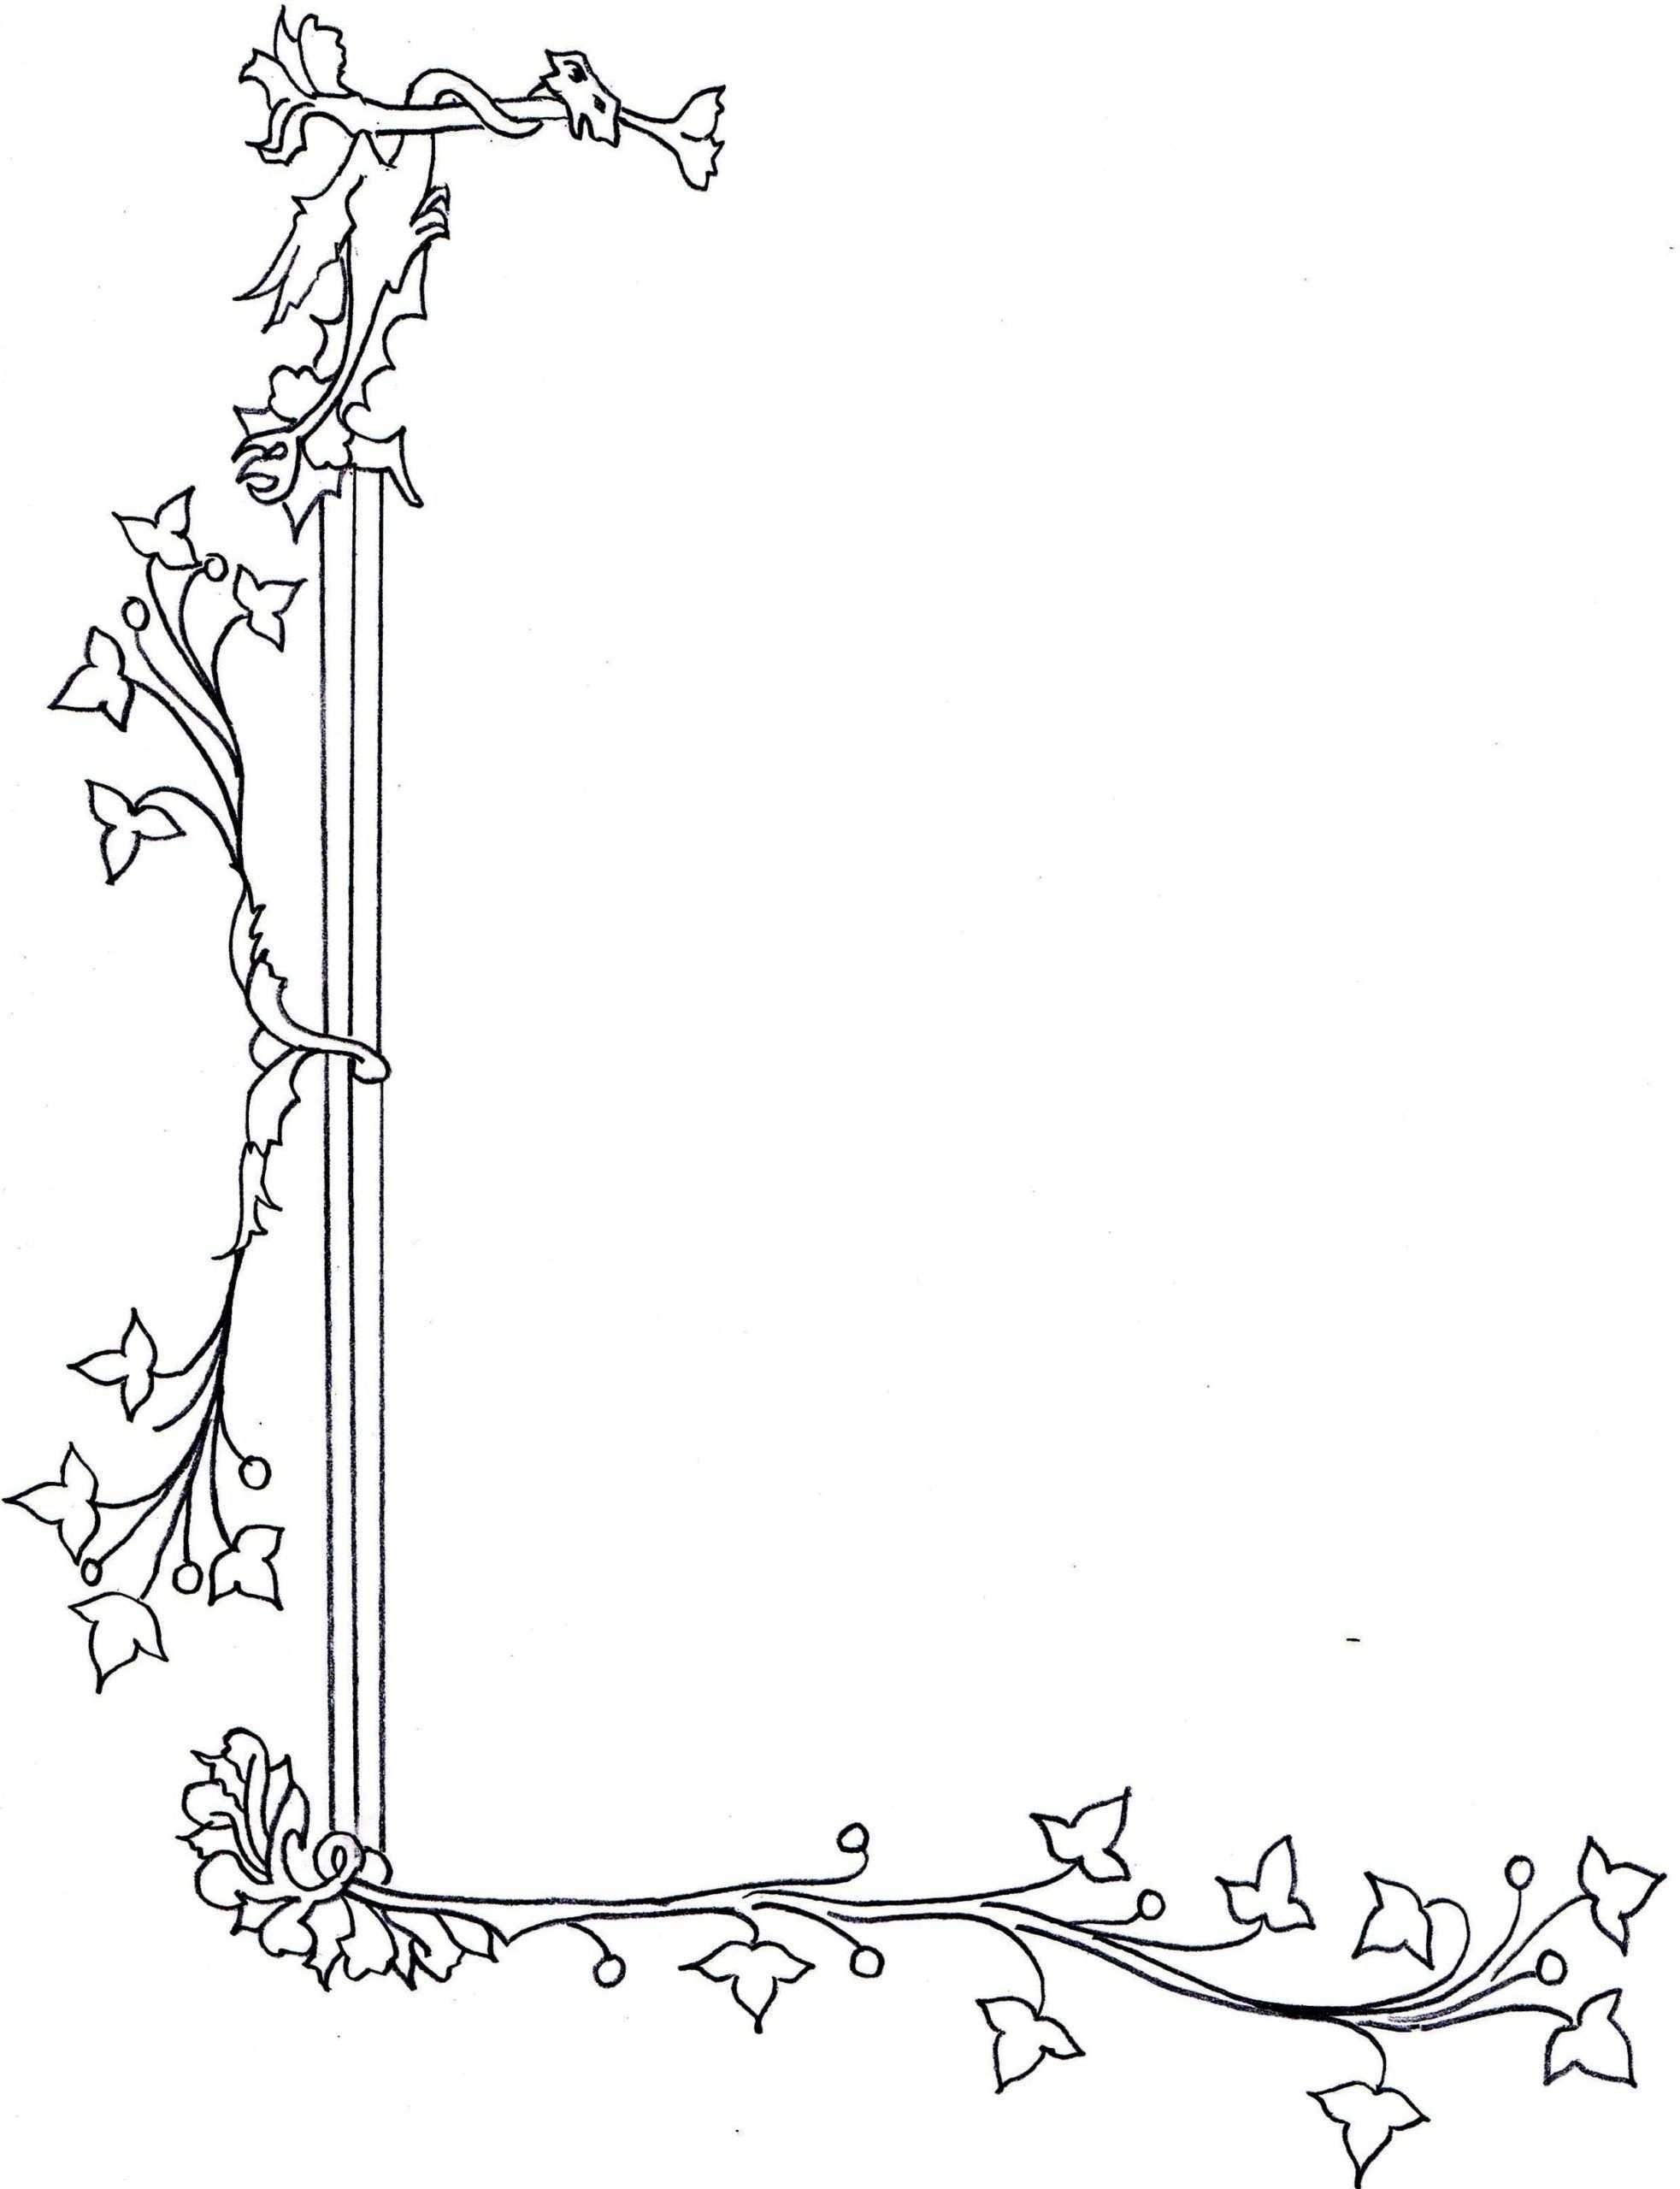 Medieval Manuscript Art Vines Flowers Google Search Art Medieval Art Medieval Manuscript